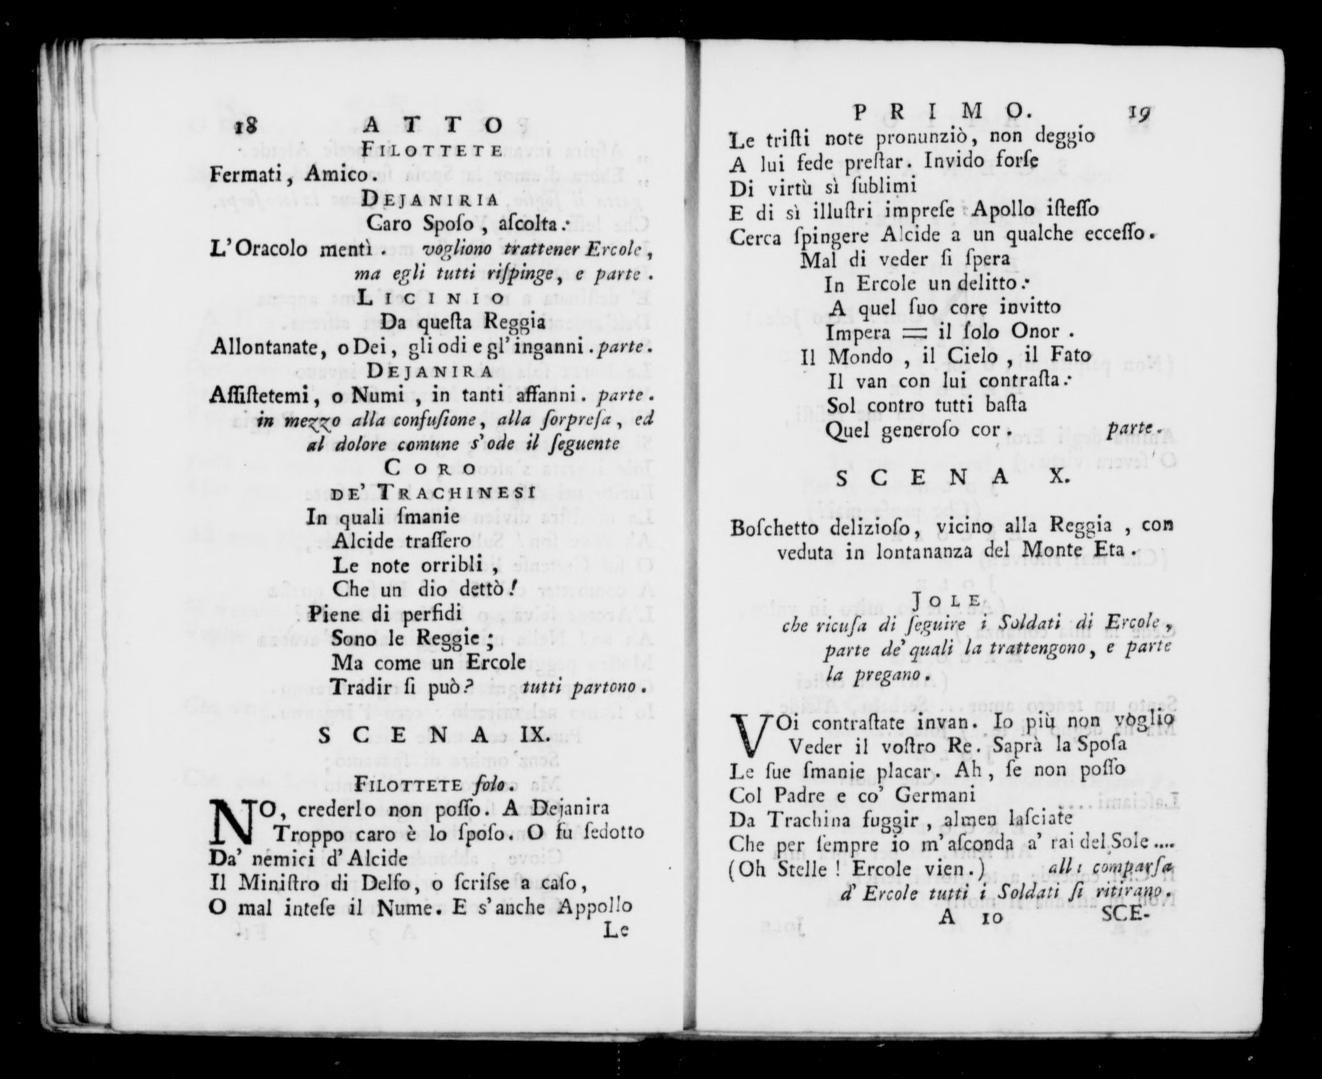 Albert Schatz Collection Apoteosi Dercole Libretto